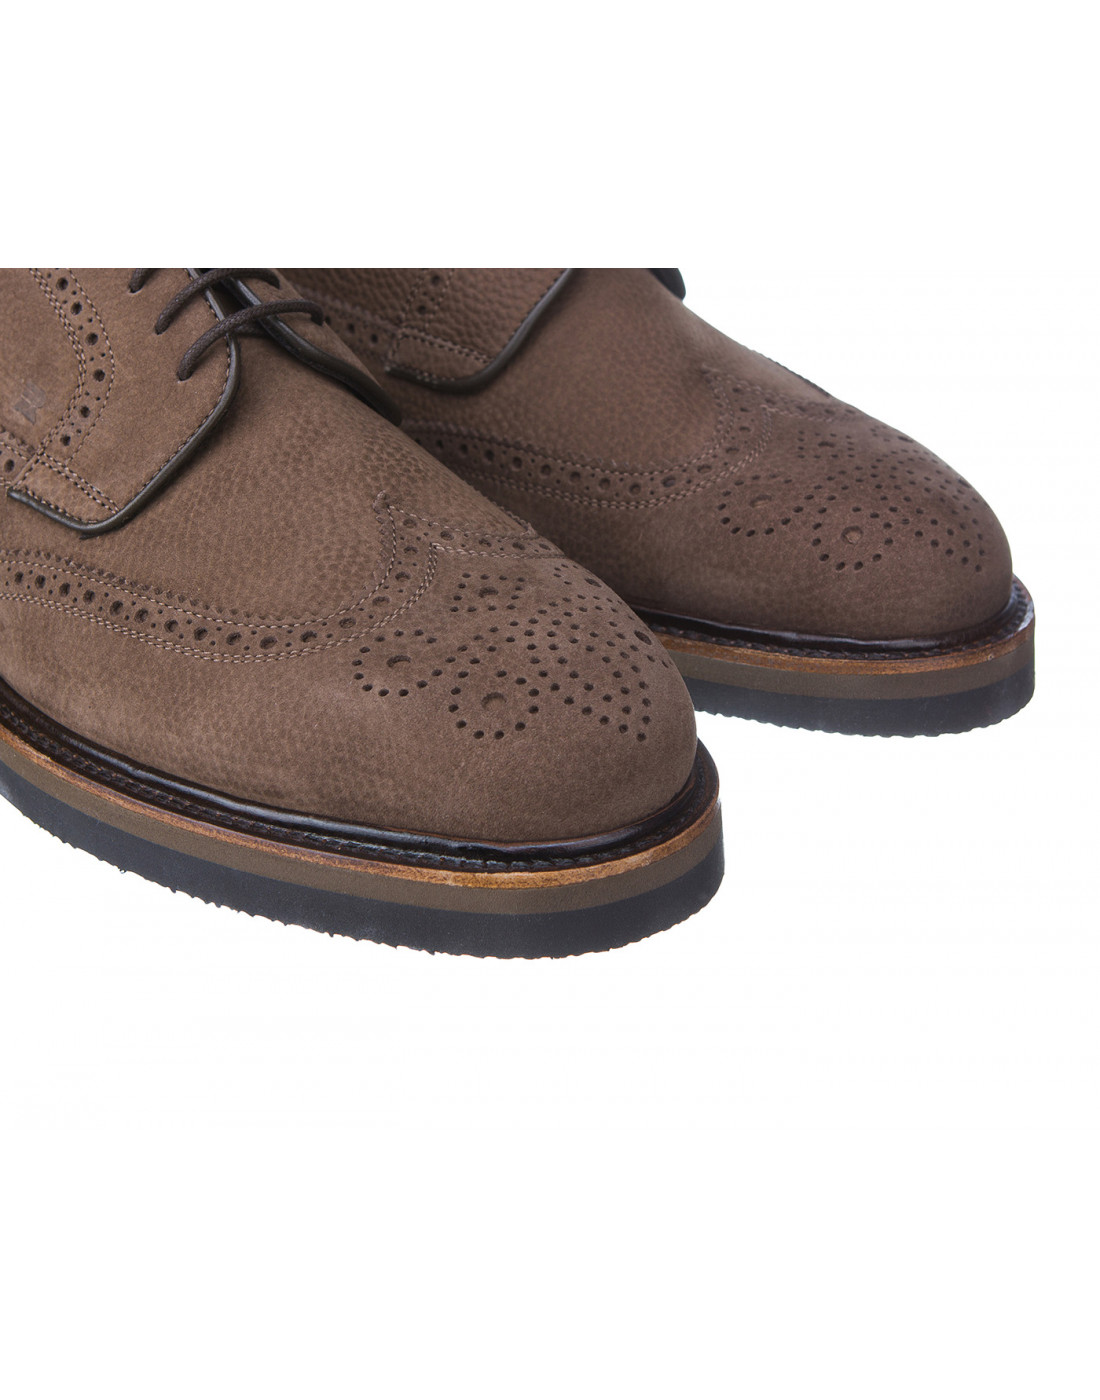 Туфли бежевые мужские Fratelli Rossetti S45900-4